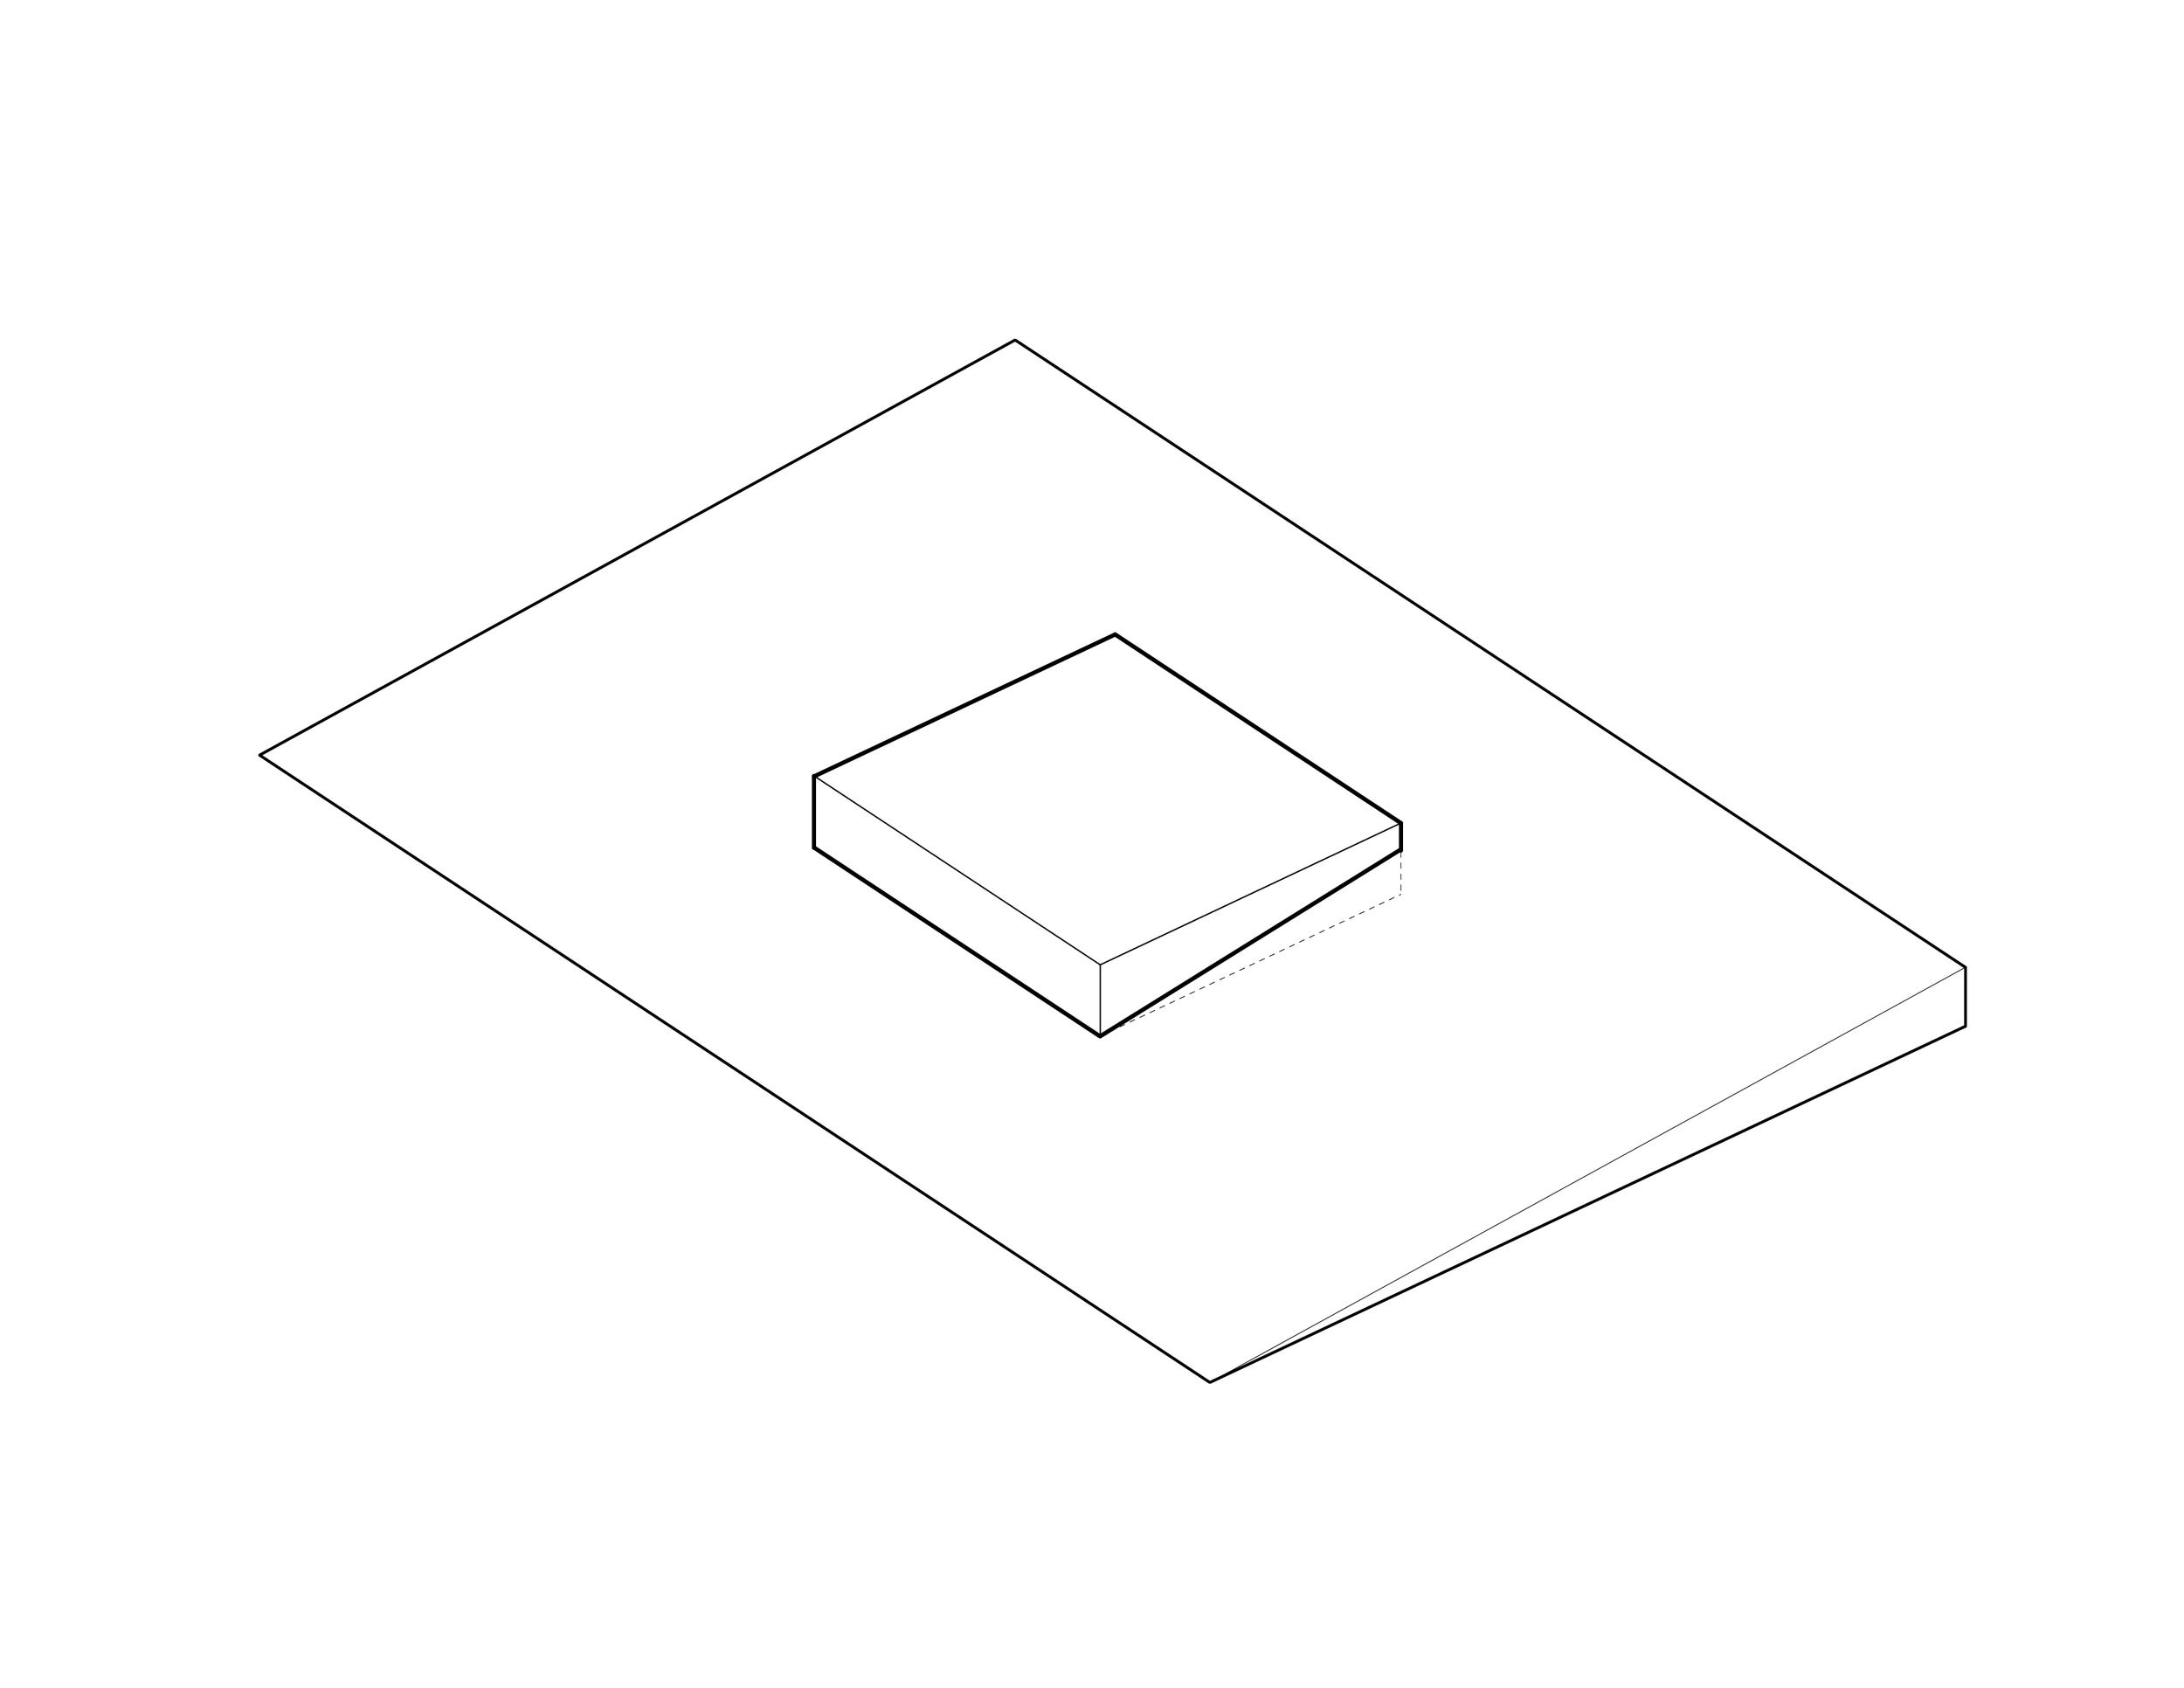 1407_02_Diagrams_Mass.jpg